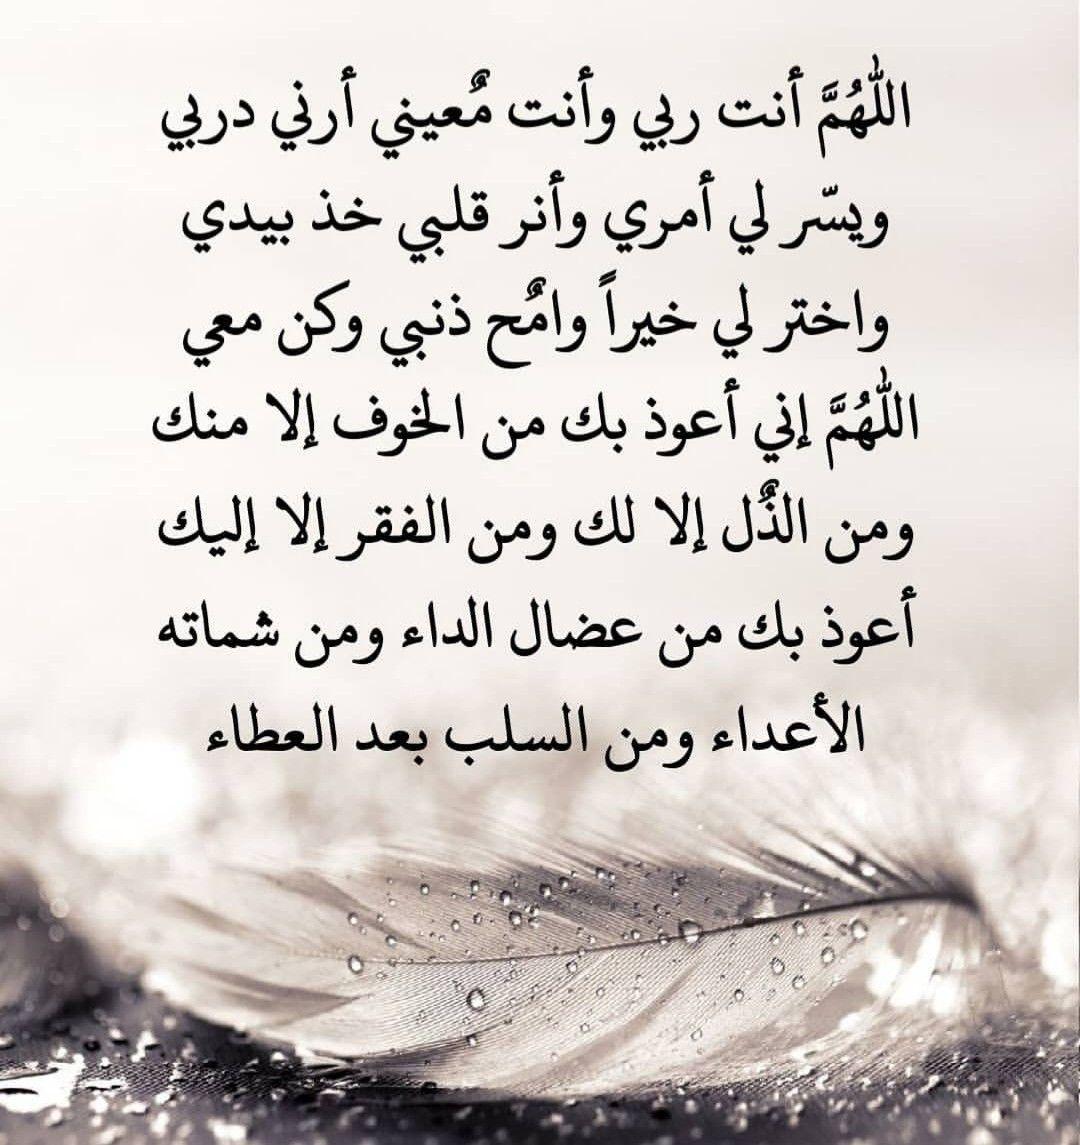 Pin By Lilac B On دعاء إلى رب غفور Duaa Islam Morning Quotes Islam Quran